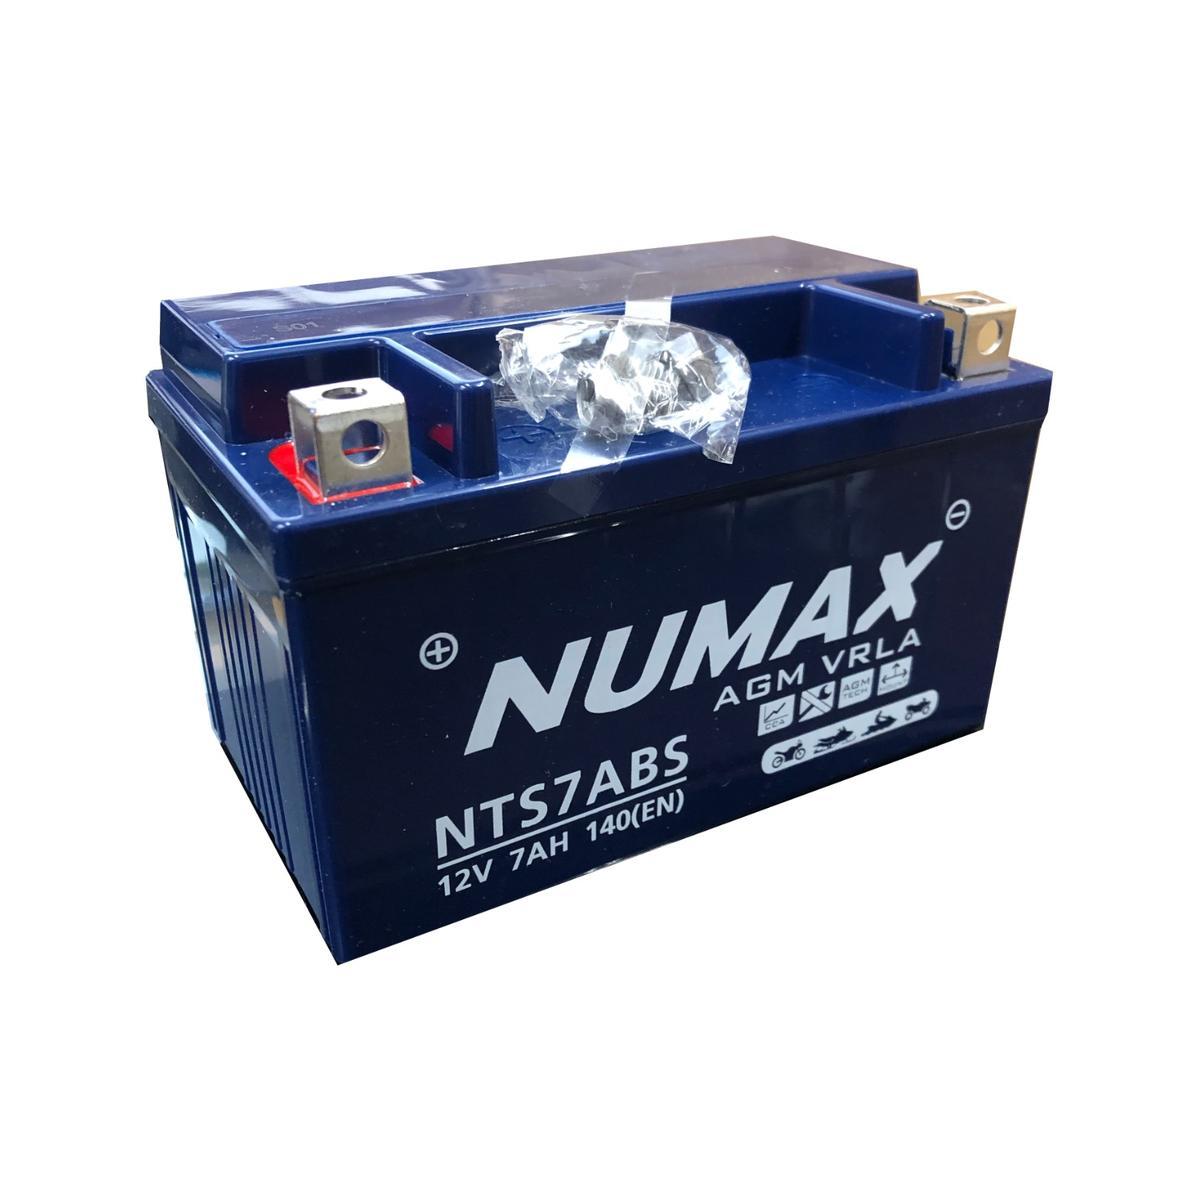 Numax NTS7ABS 12v Motorbike Bike Battery SUZUKI 150cc AN150 YTX7A-B2